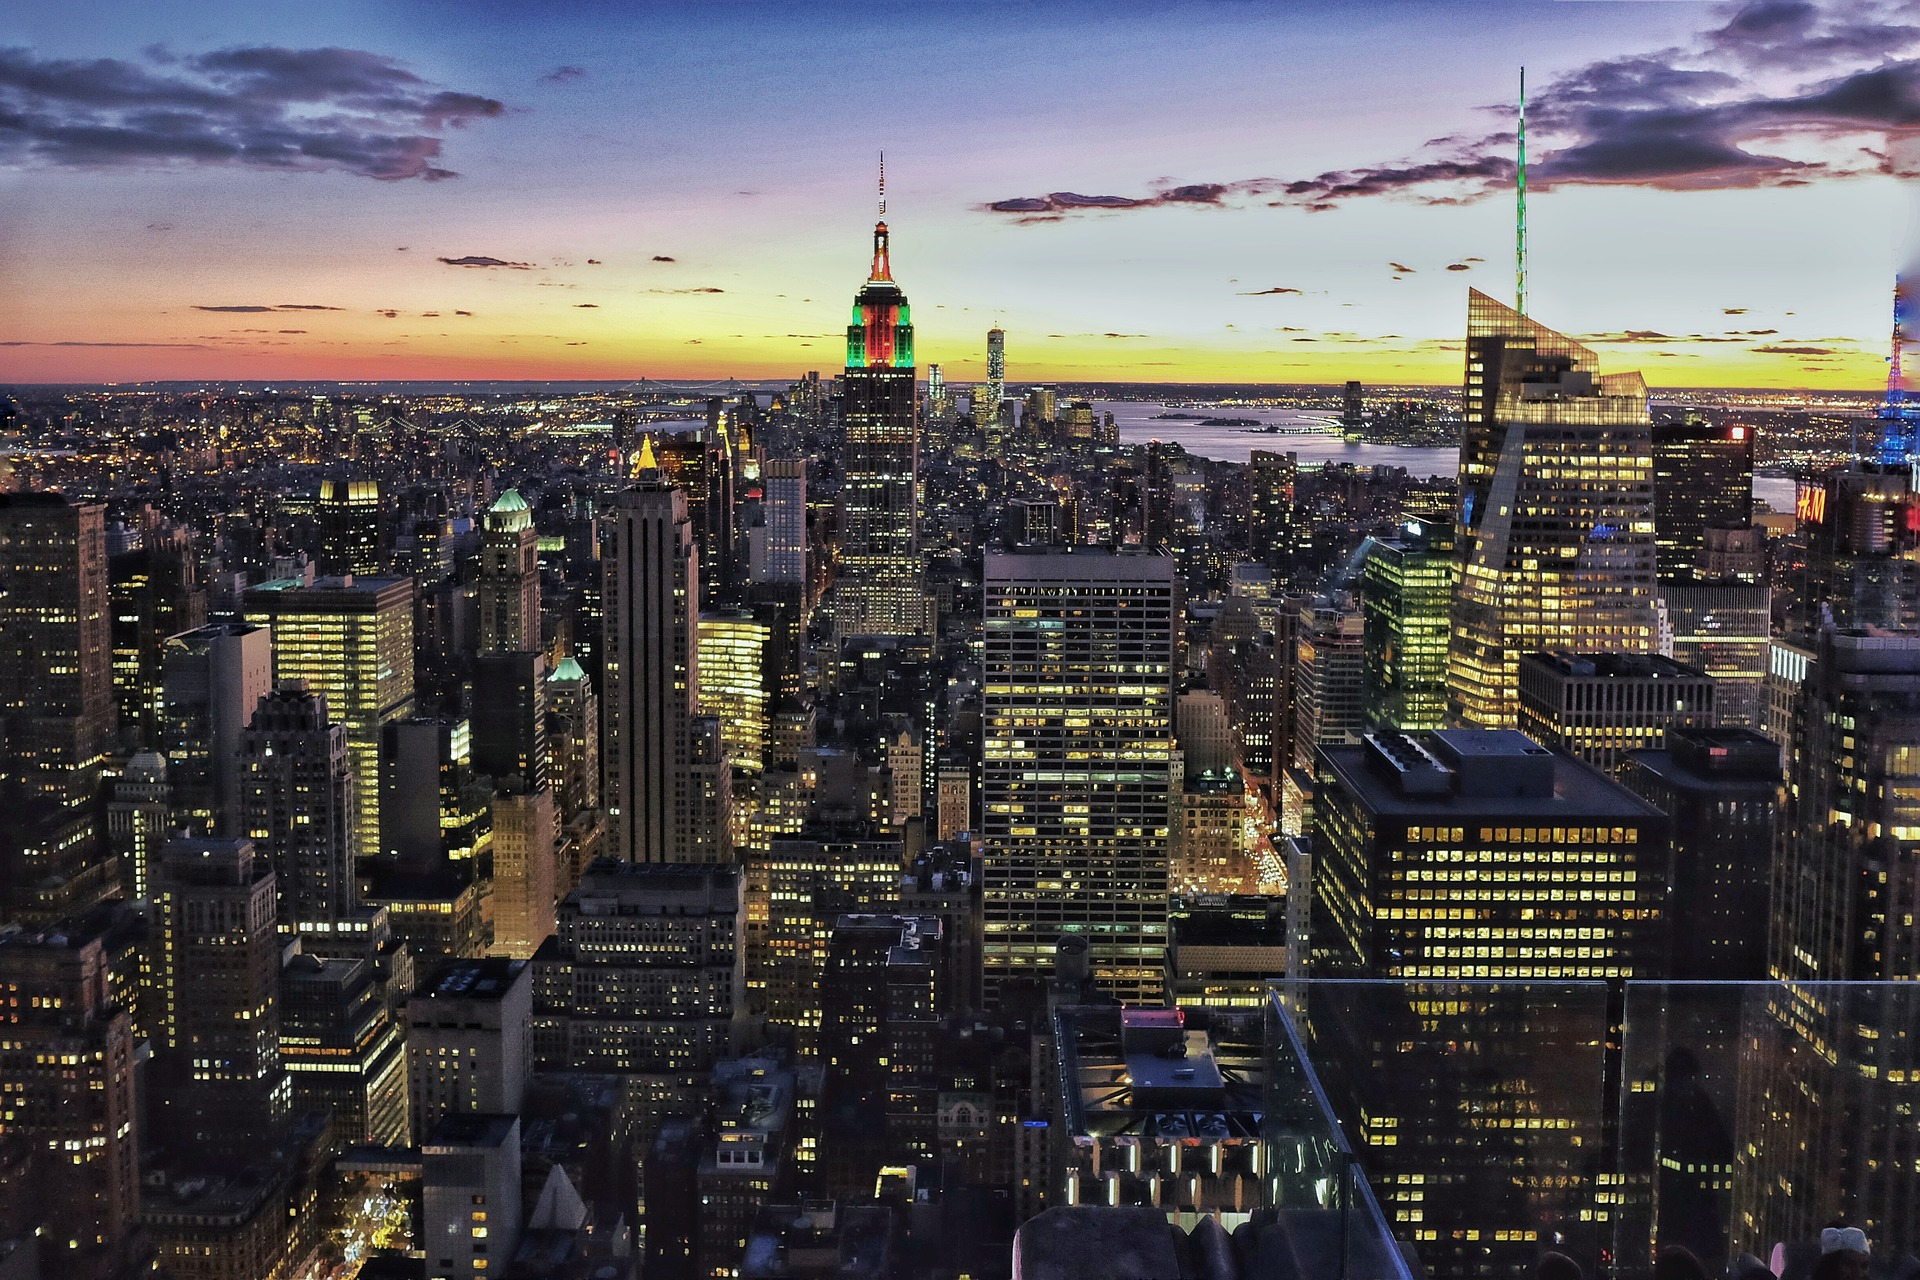 itinerari-originali-per-visitare-new-york